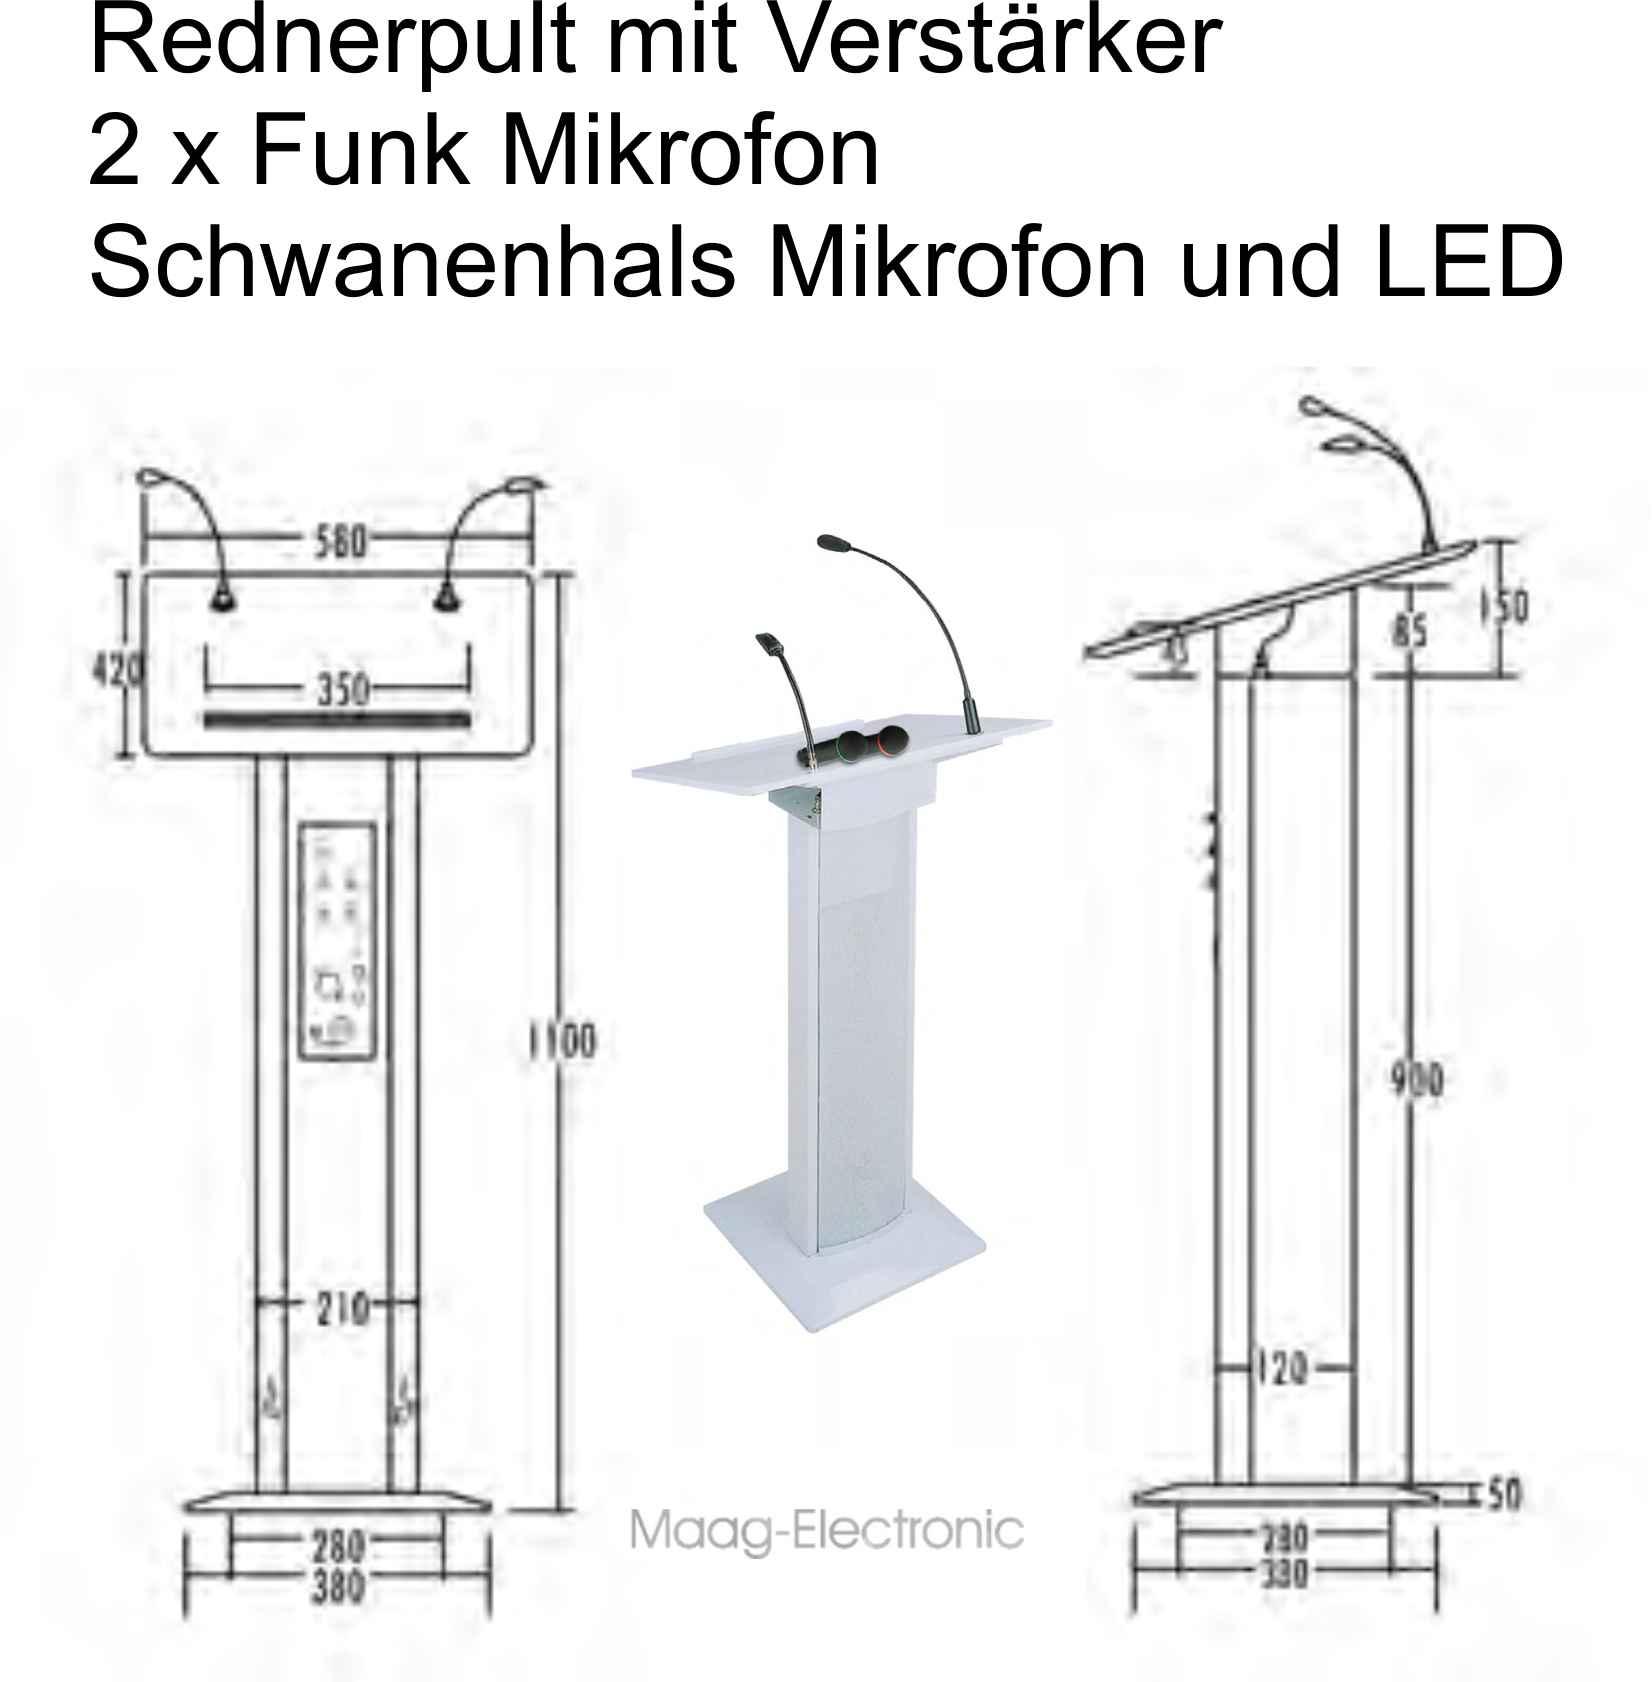 rednerpult verst rker mikro lautsprecher funkmikrofon. Black Bedroom Furniture Sets. Home Design Ideas